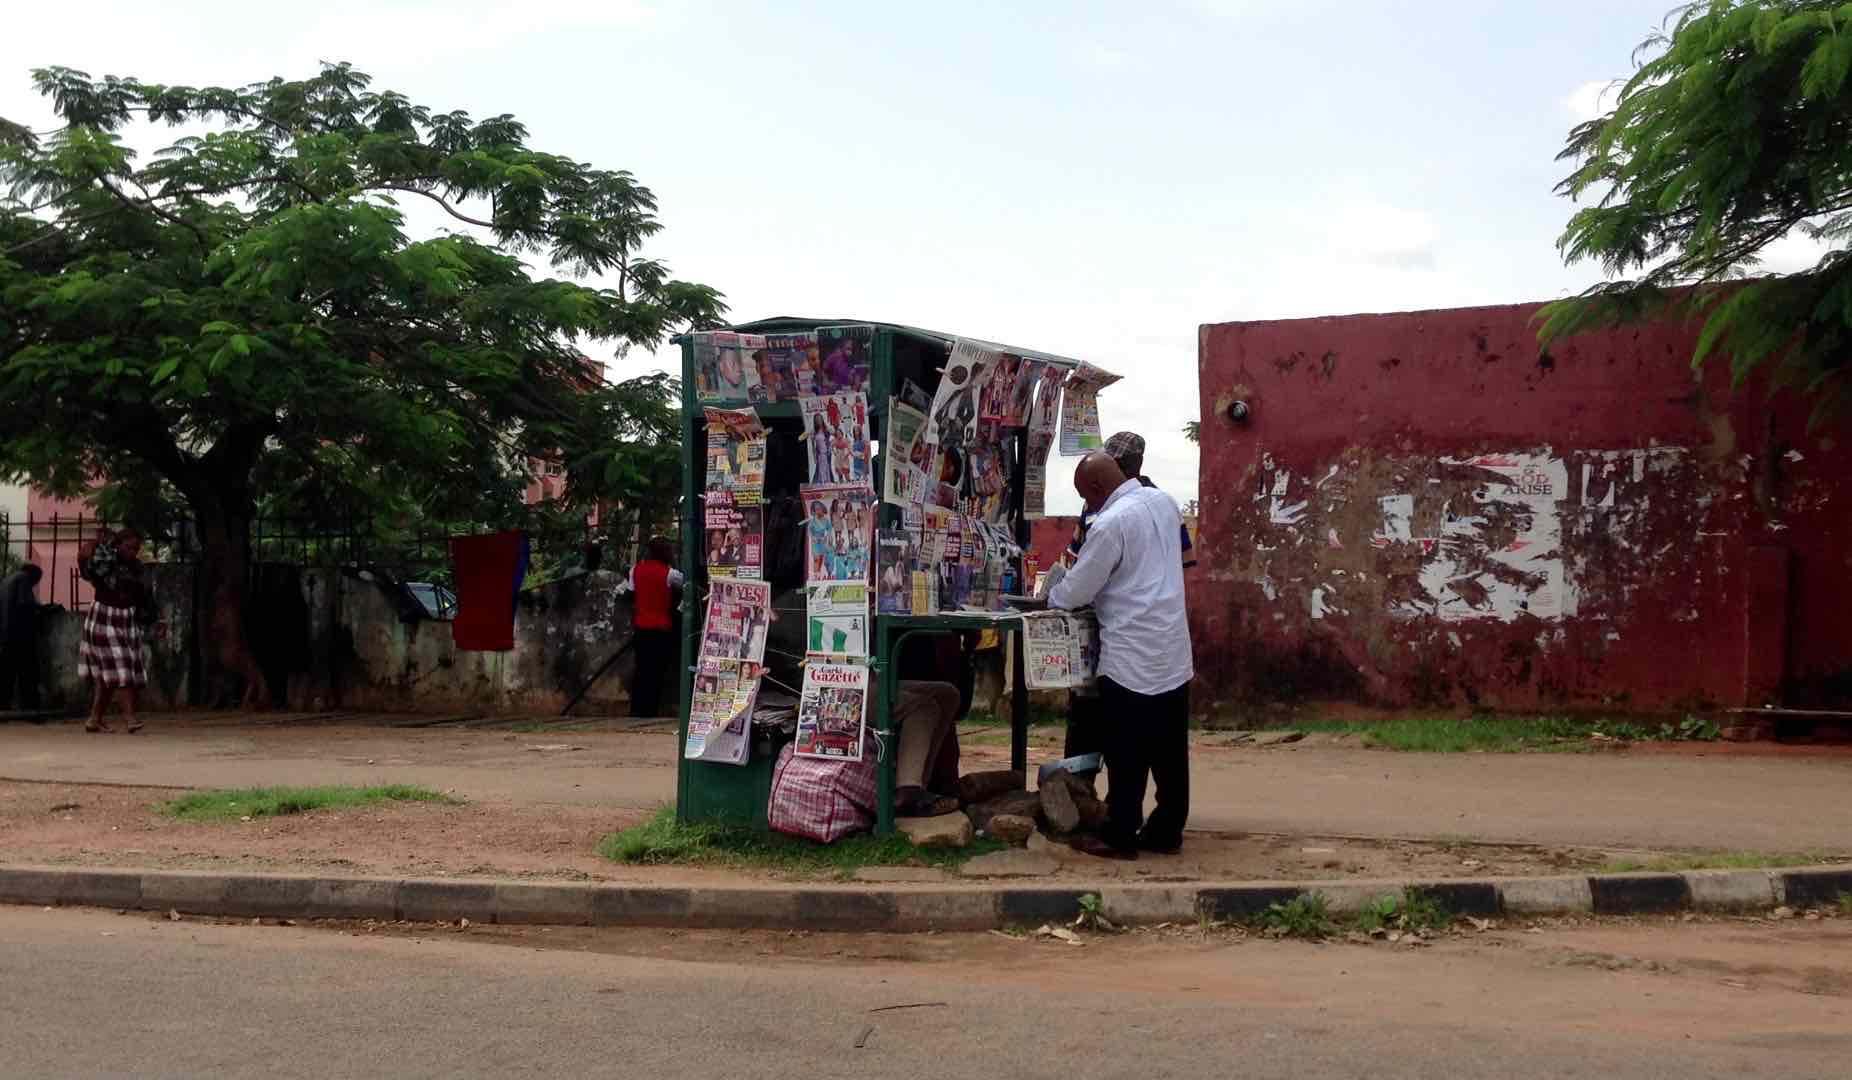 Newsstand in Abuja, Nigeria. #JujuFilms